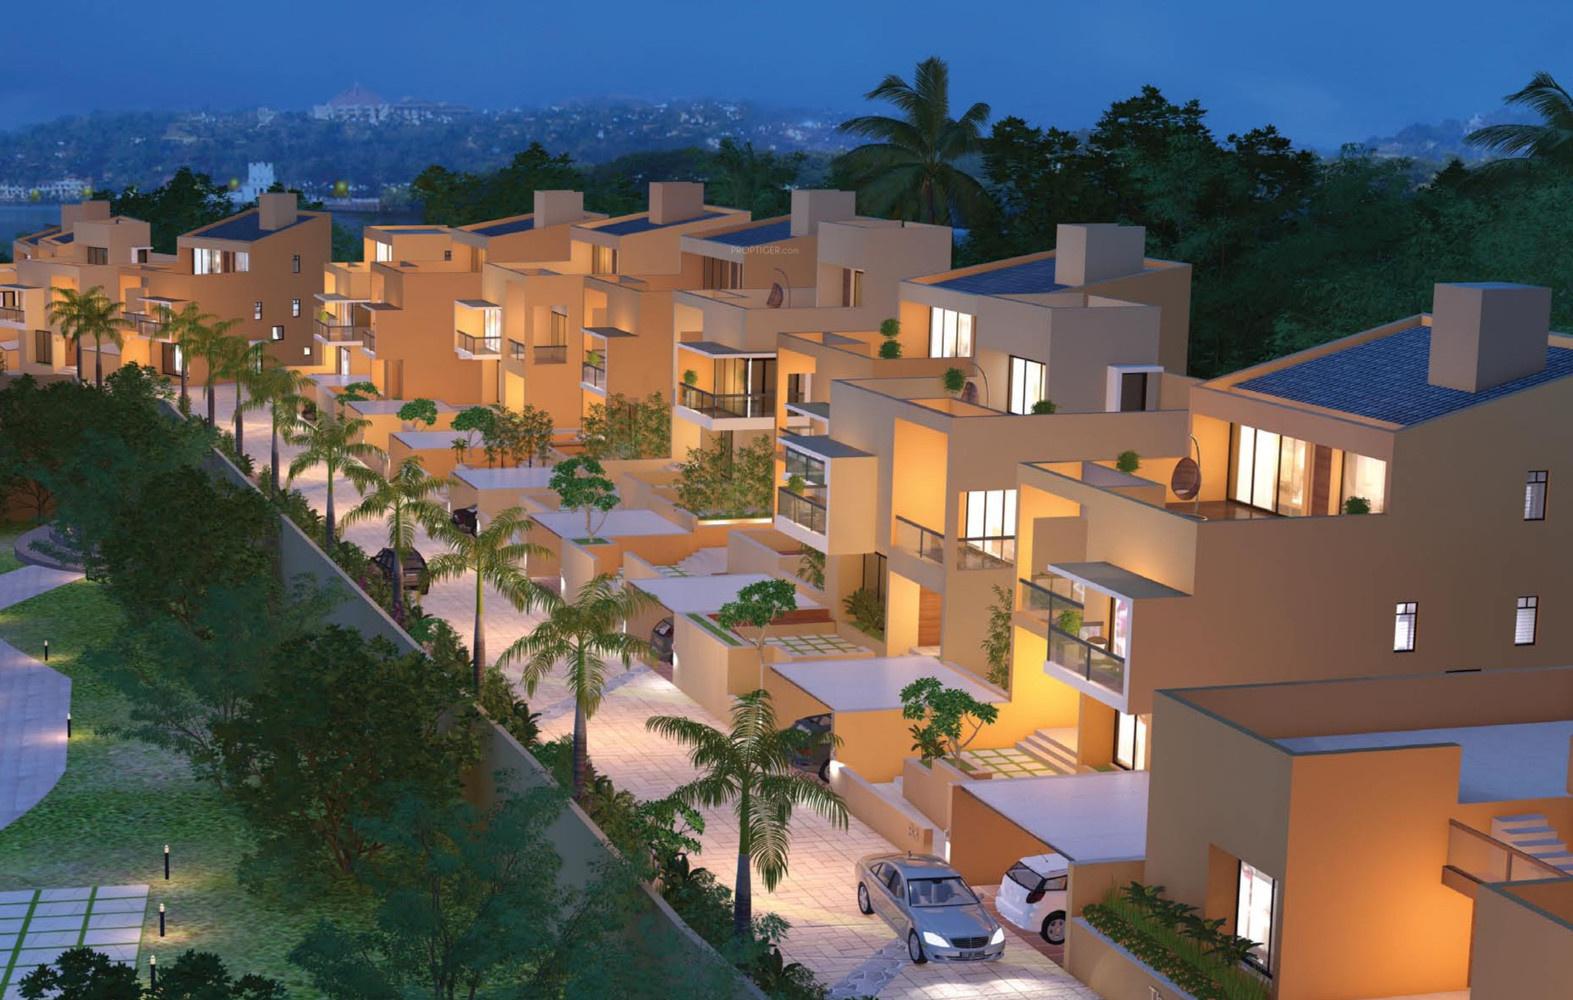 Alcon Serenity Avenue Phase II in Chimbel, Goa - Price